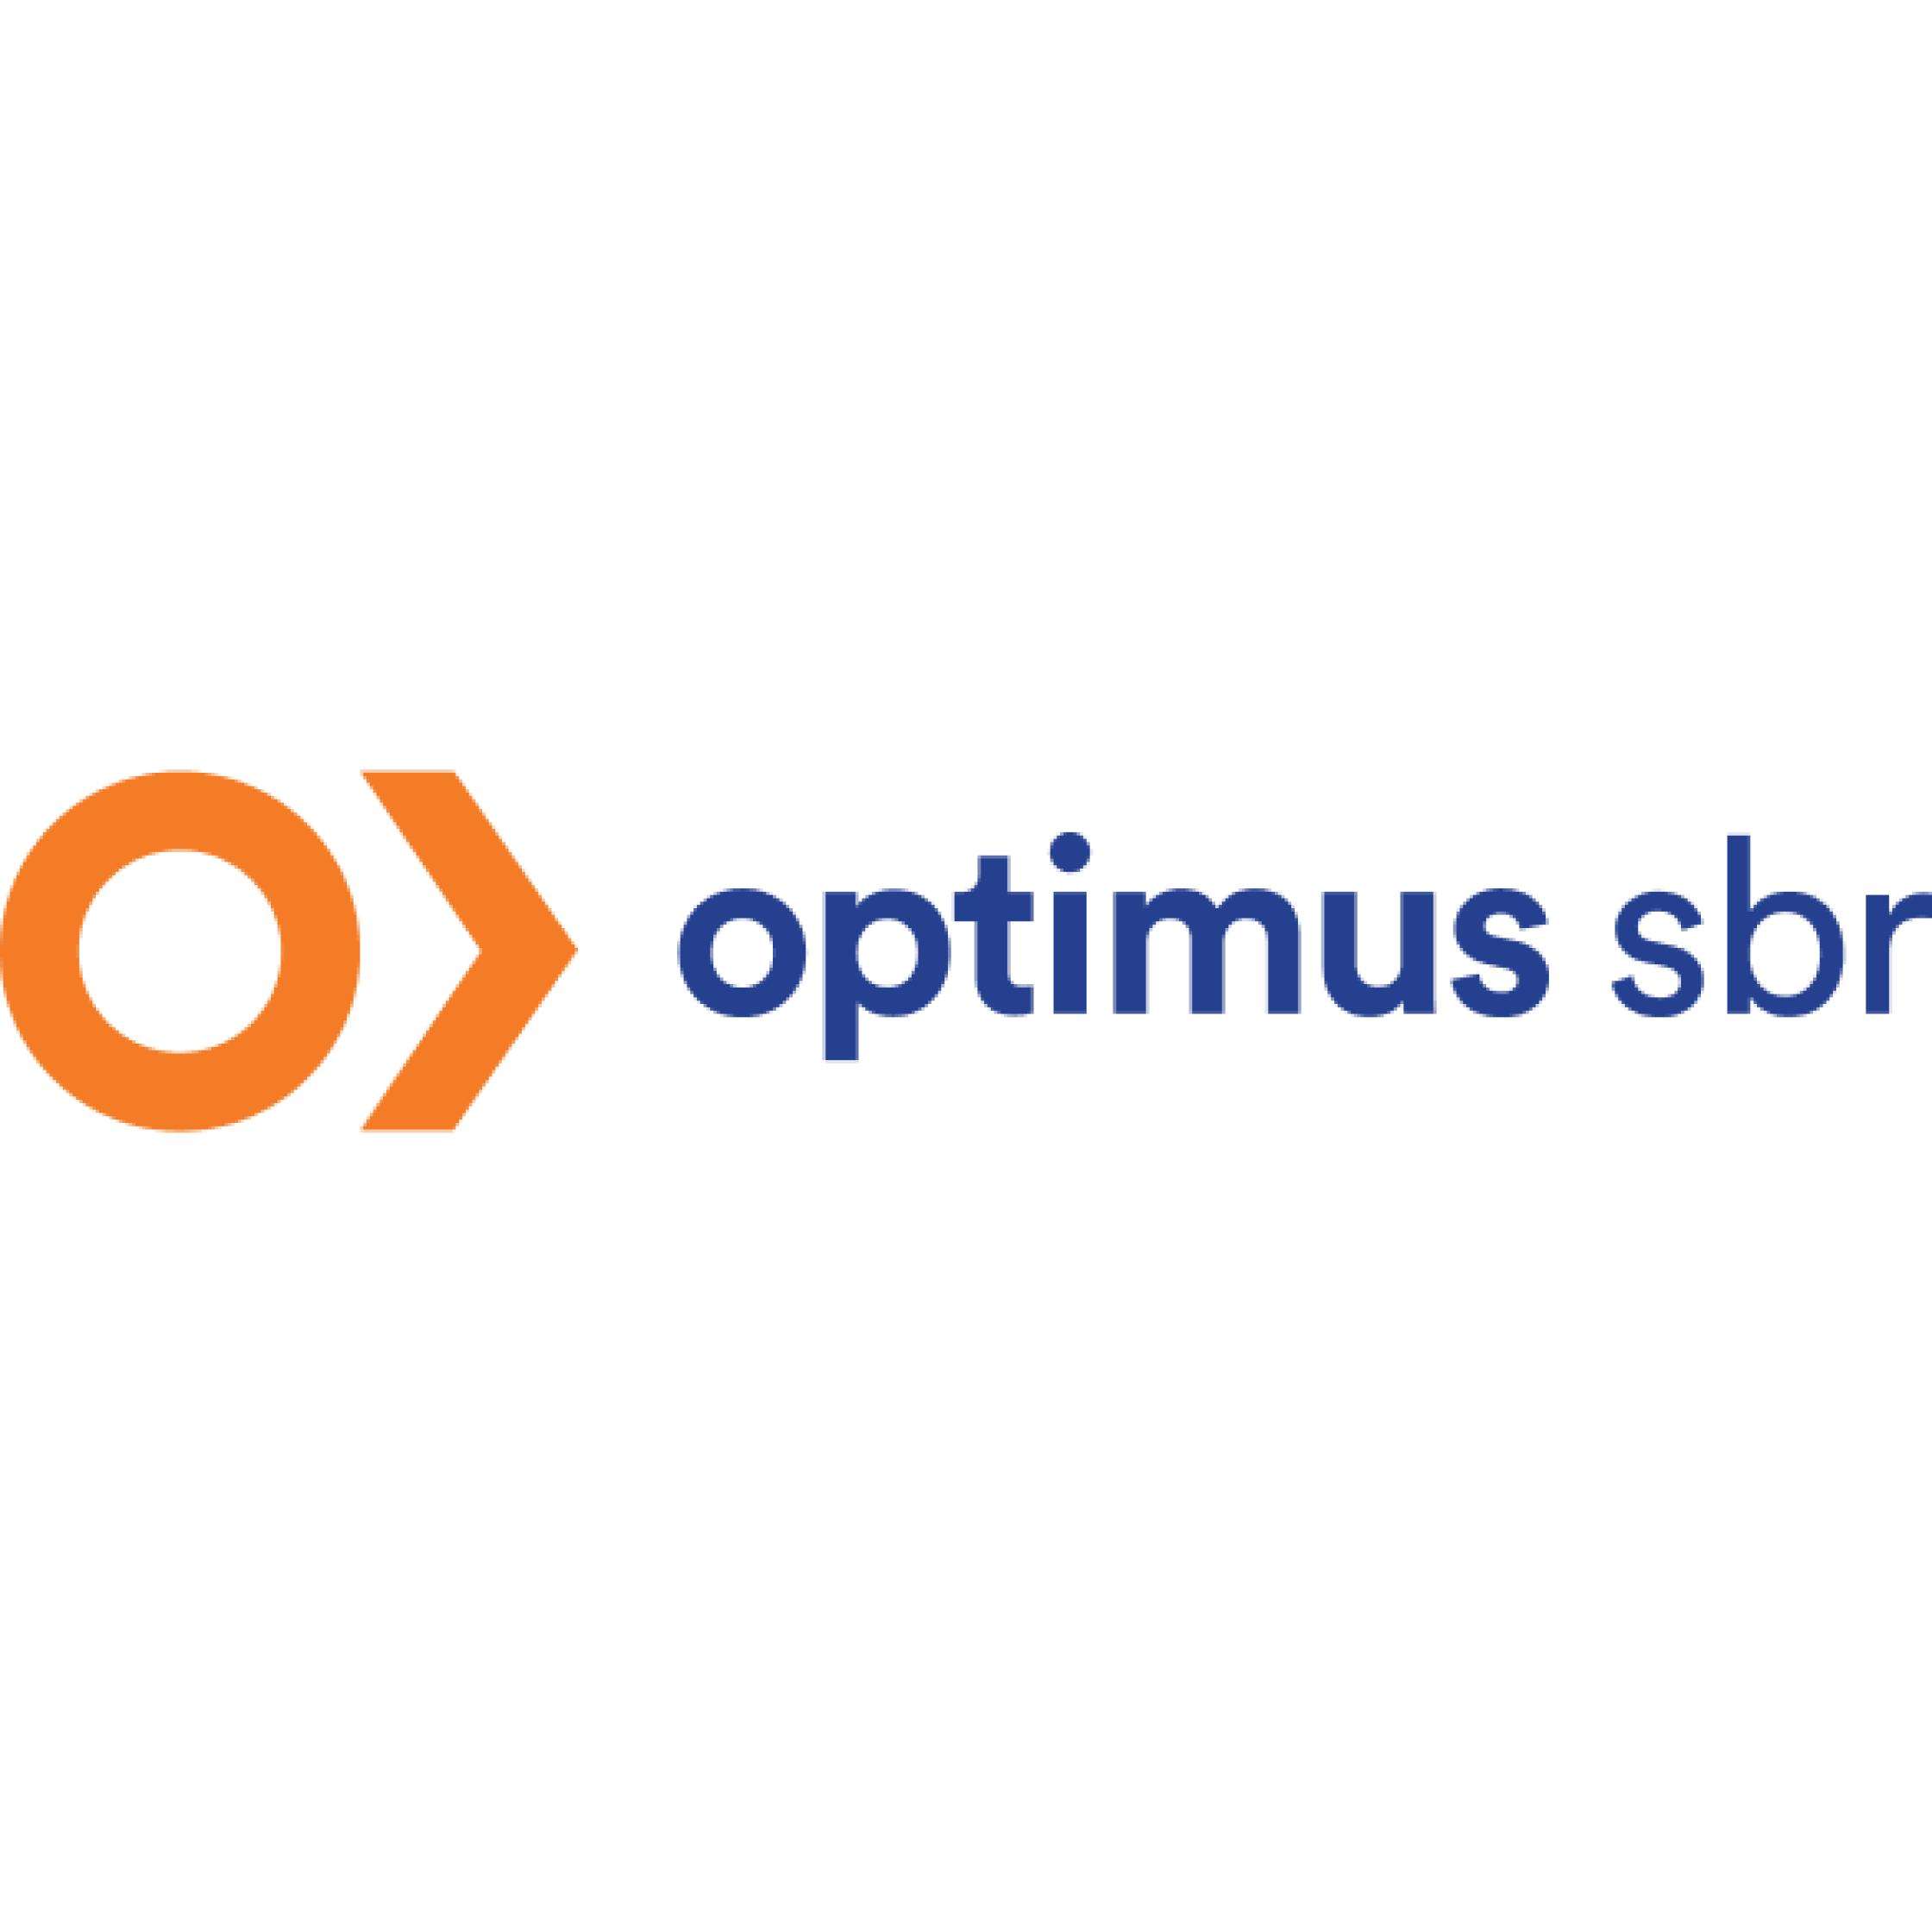 Optimus SBR logo